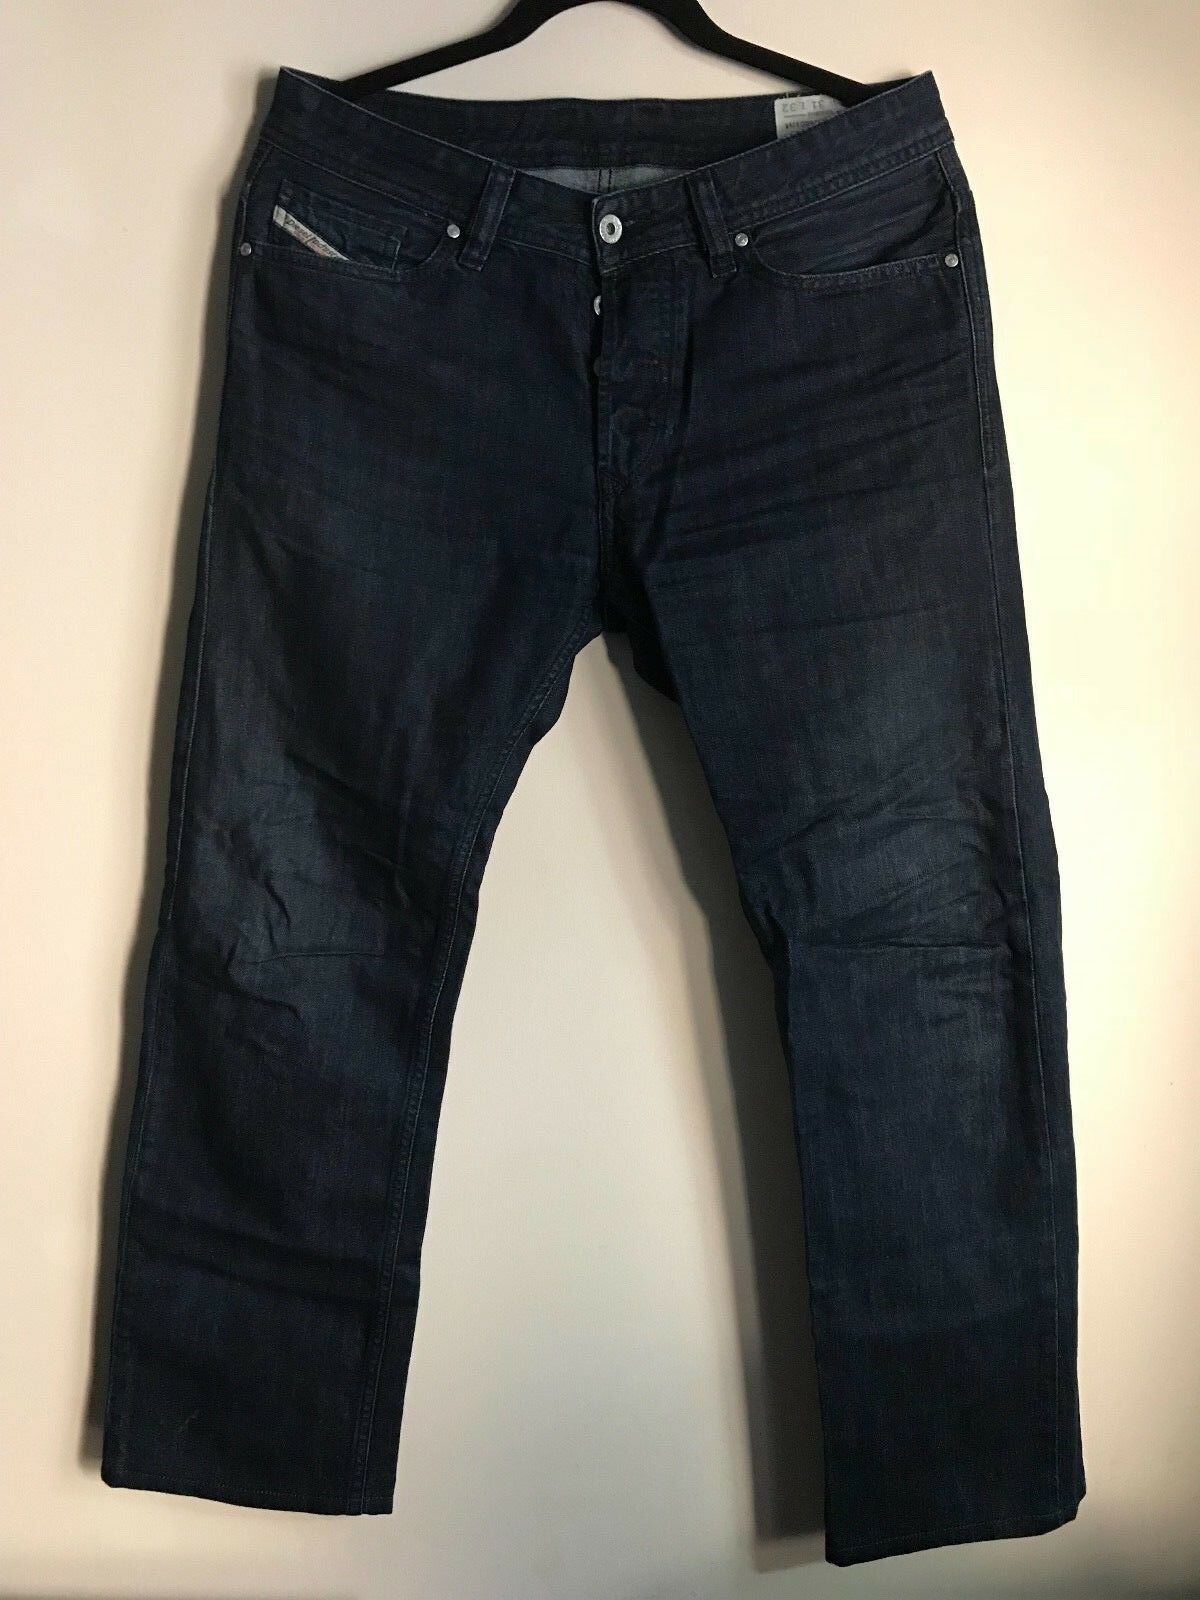 DIESEL Viker OR933 31x29 bluee Regular Straight Jeans 0R933